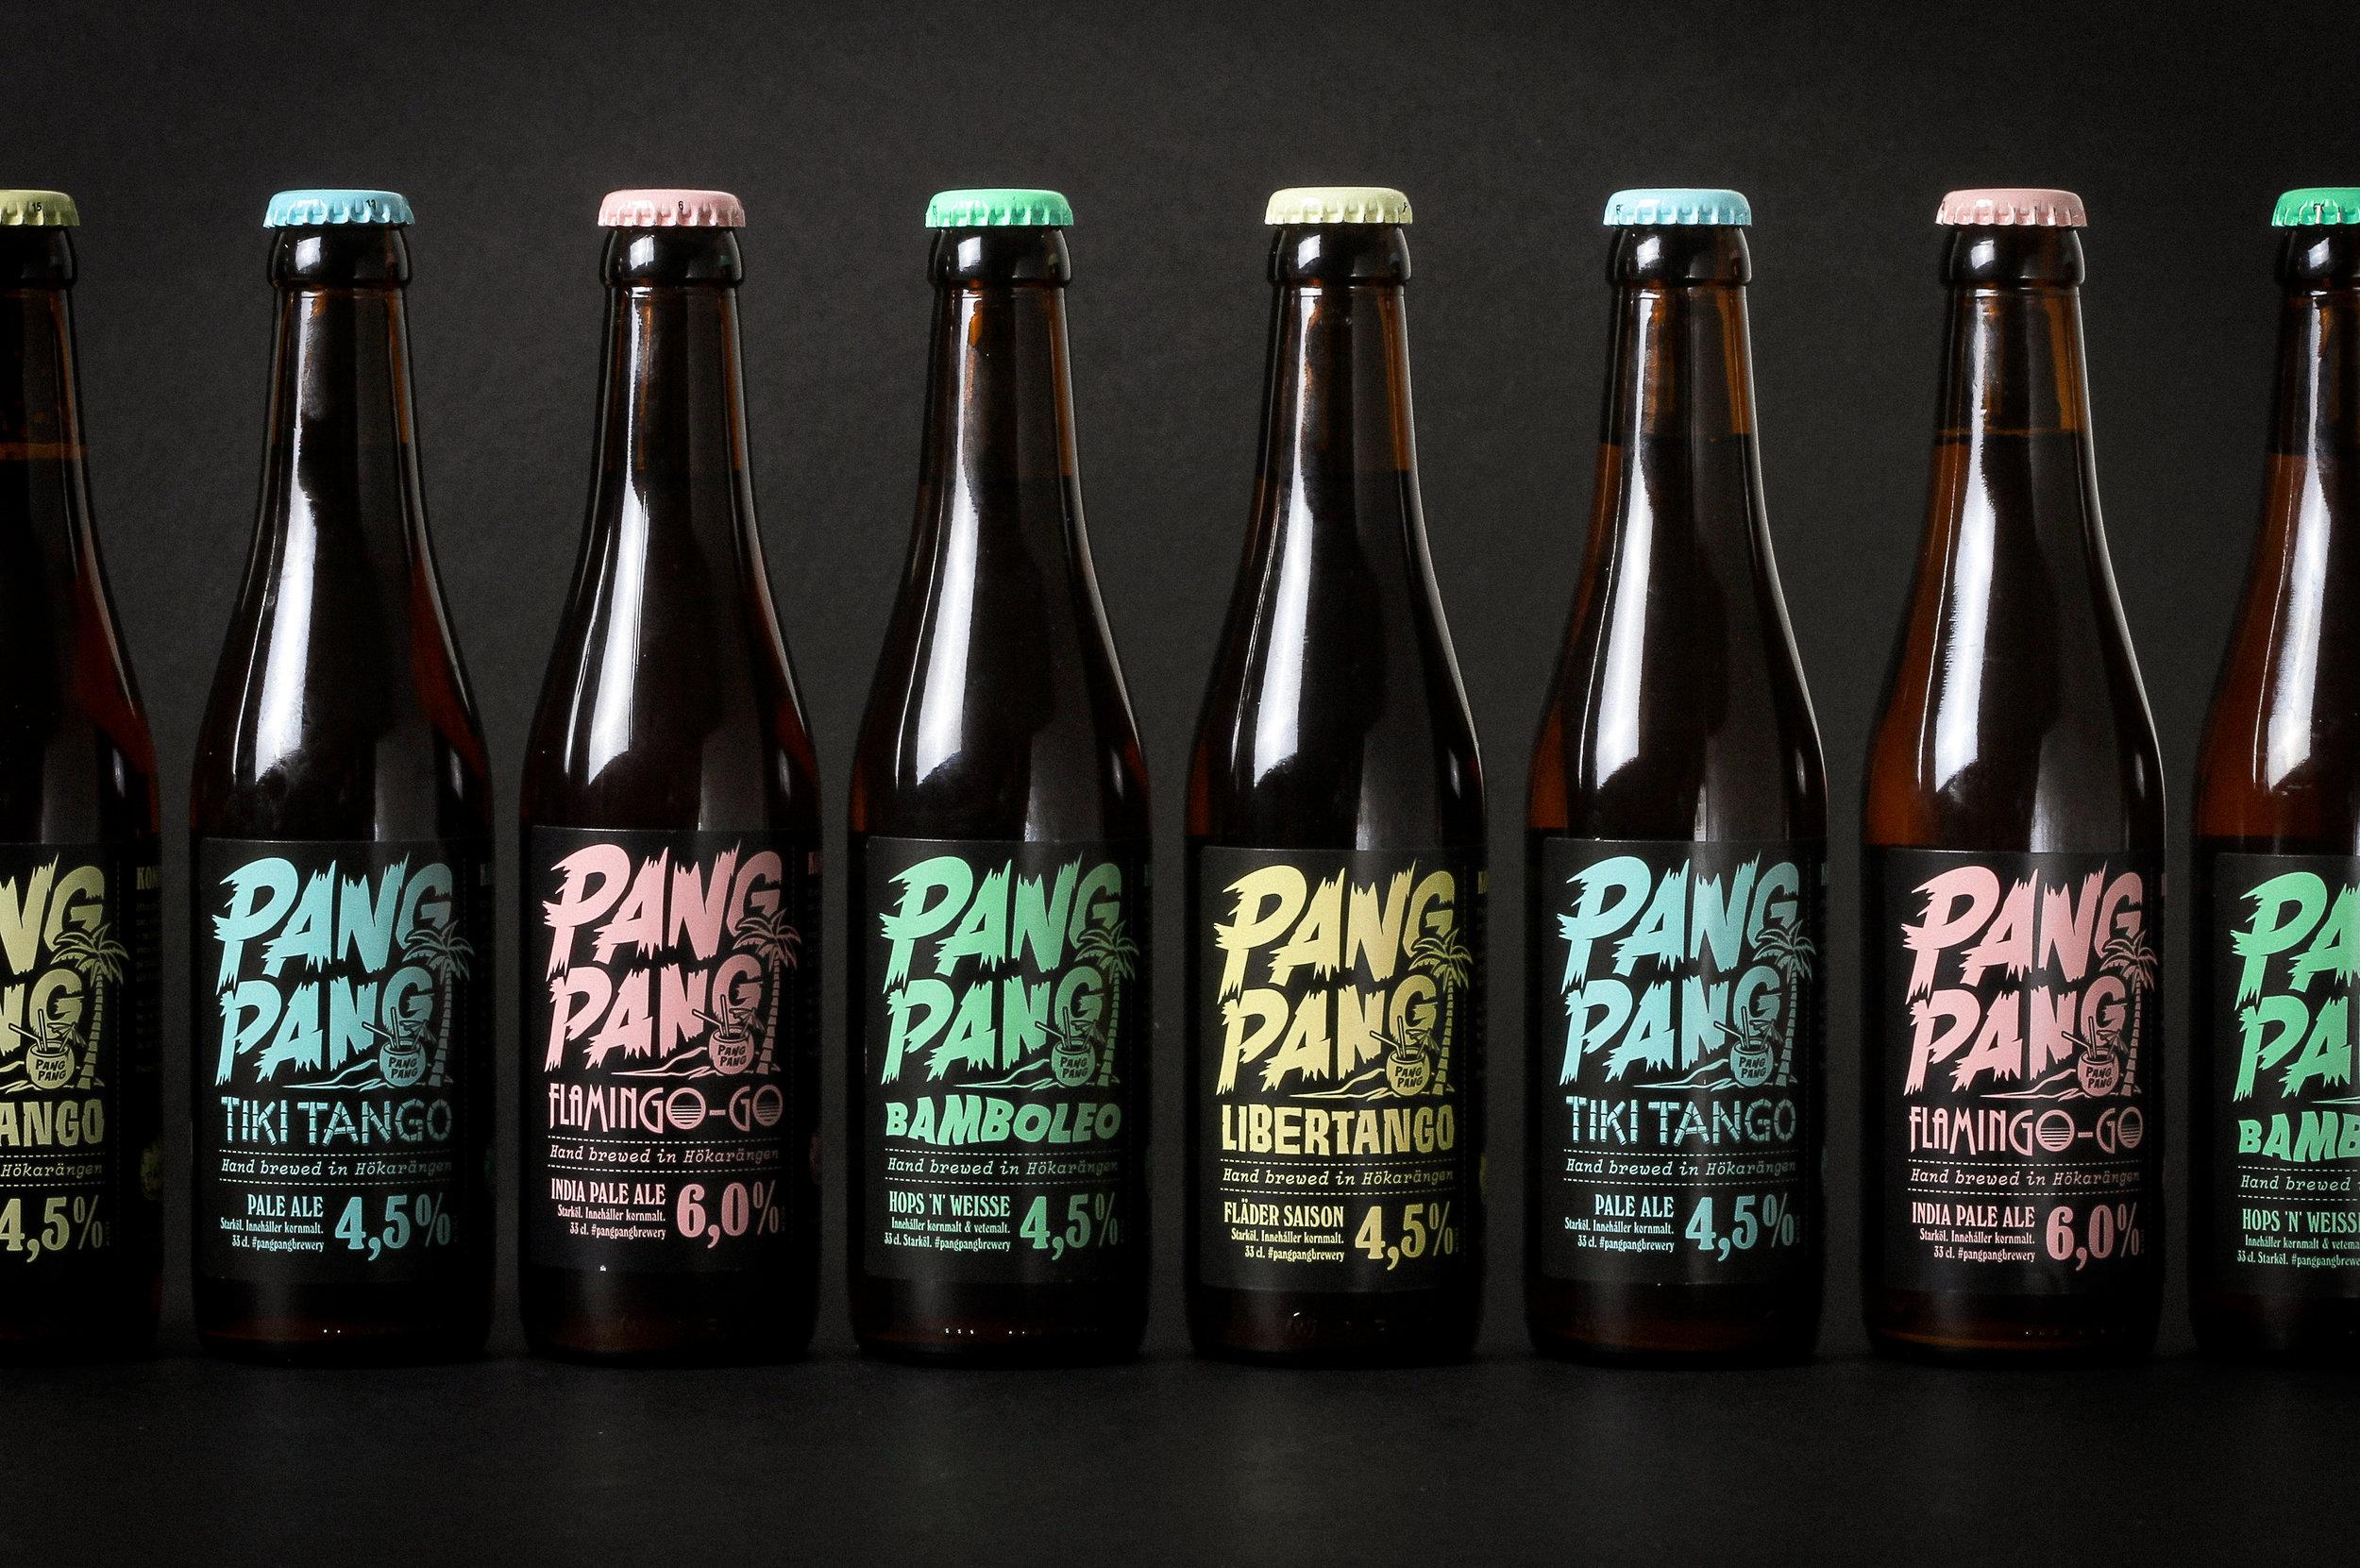 pangpang_04_bottles-row.jpg